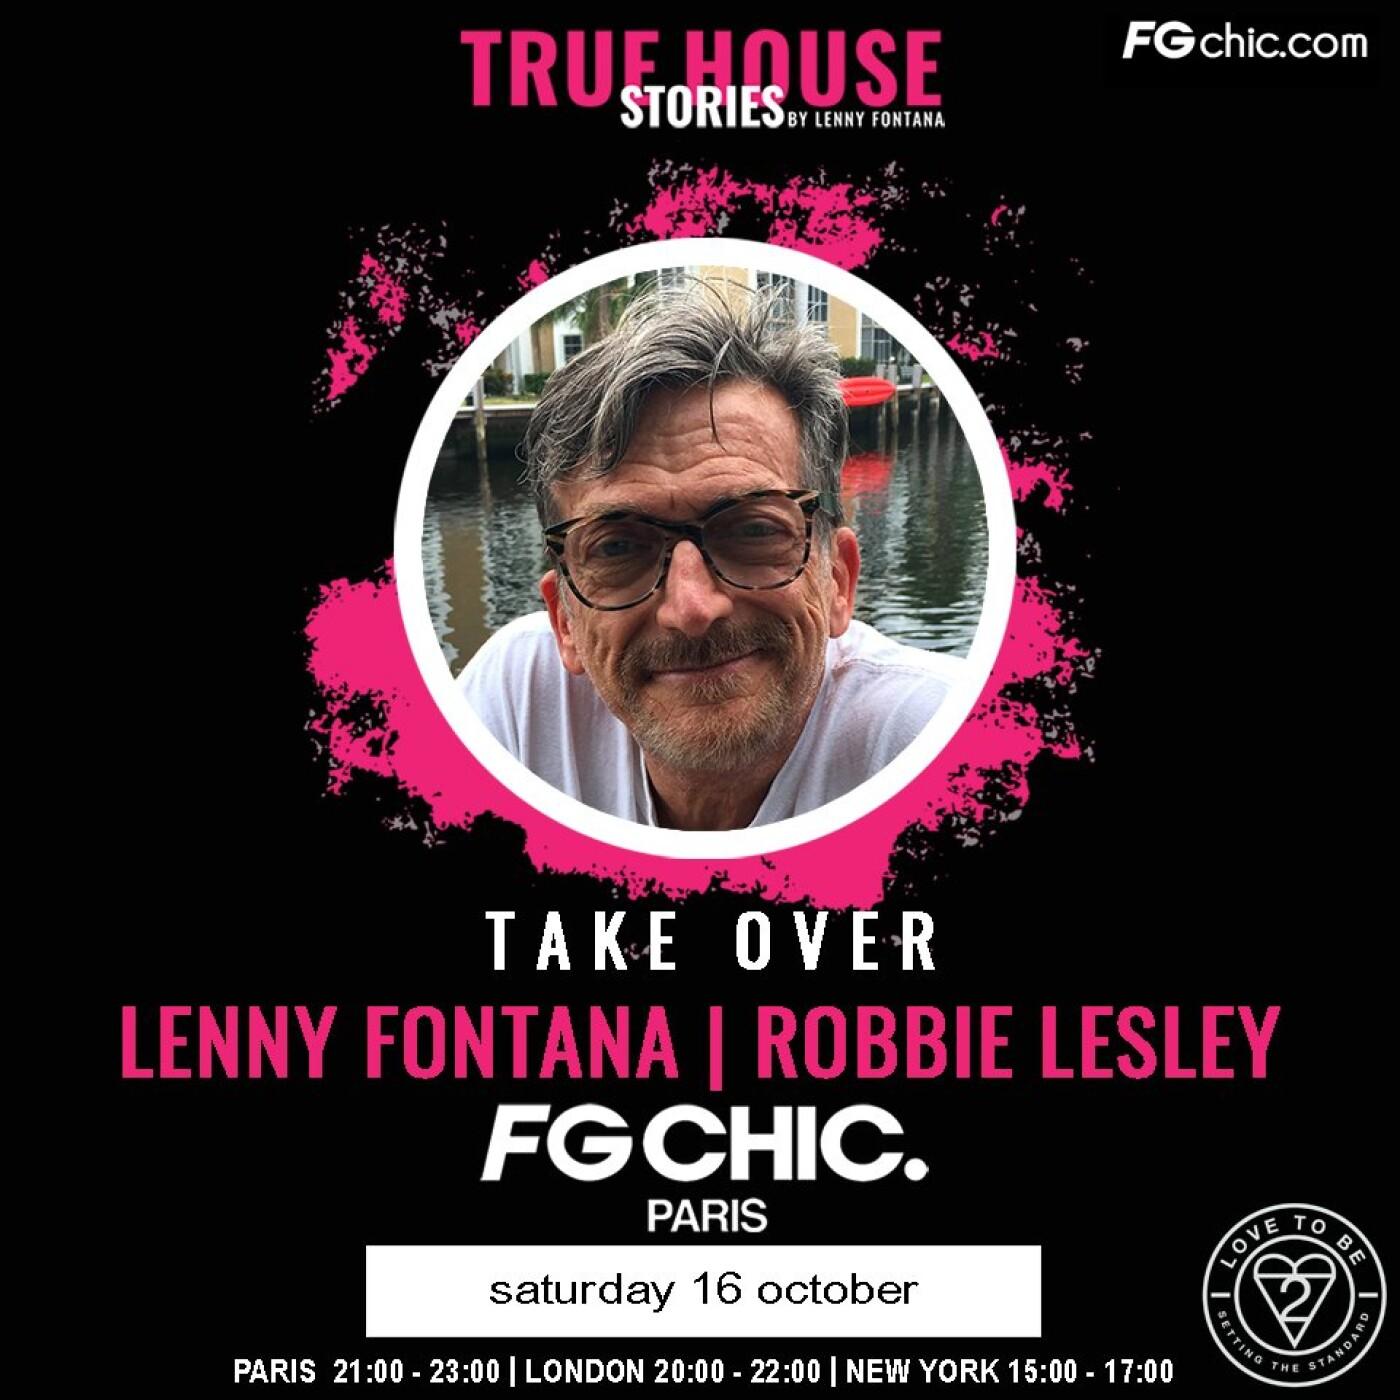 TRUE HOUSE STORIES BY LENNY FONTANA AVEC ROBBIE LESLEY DU 16...